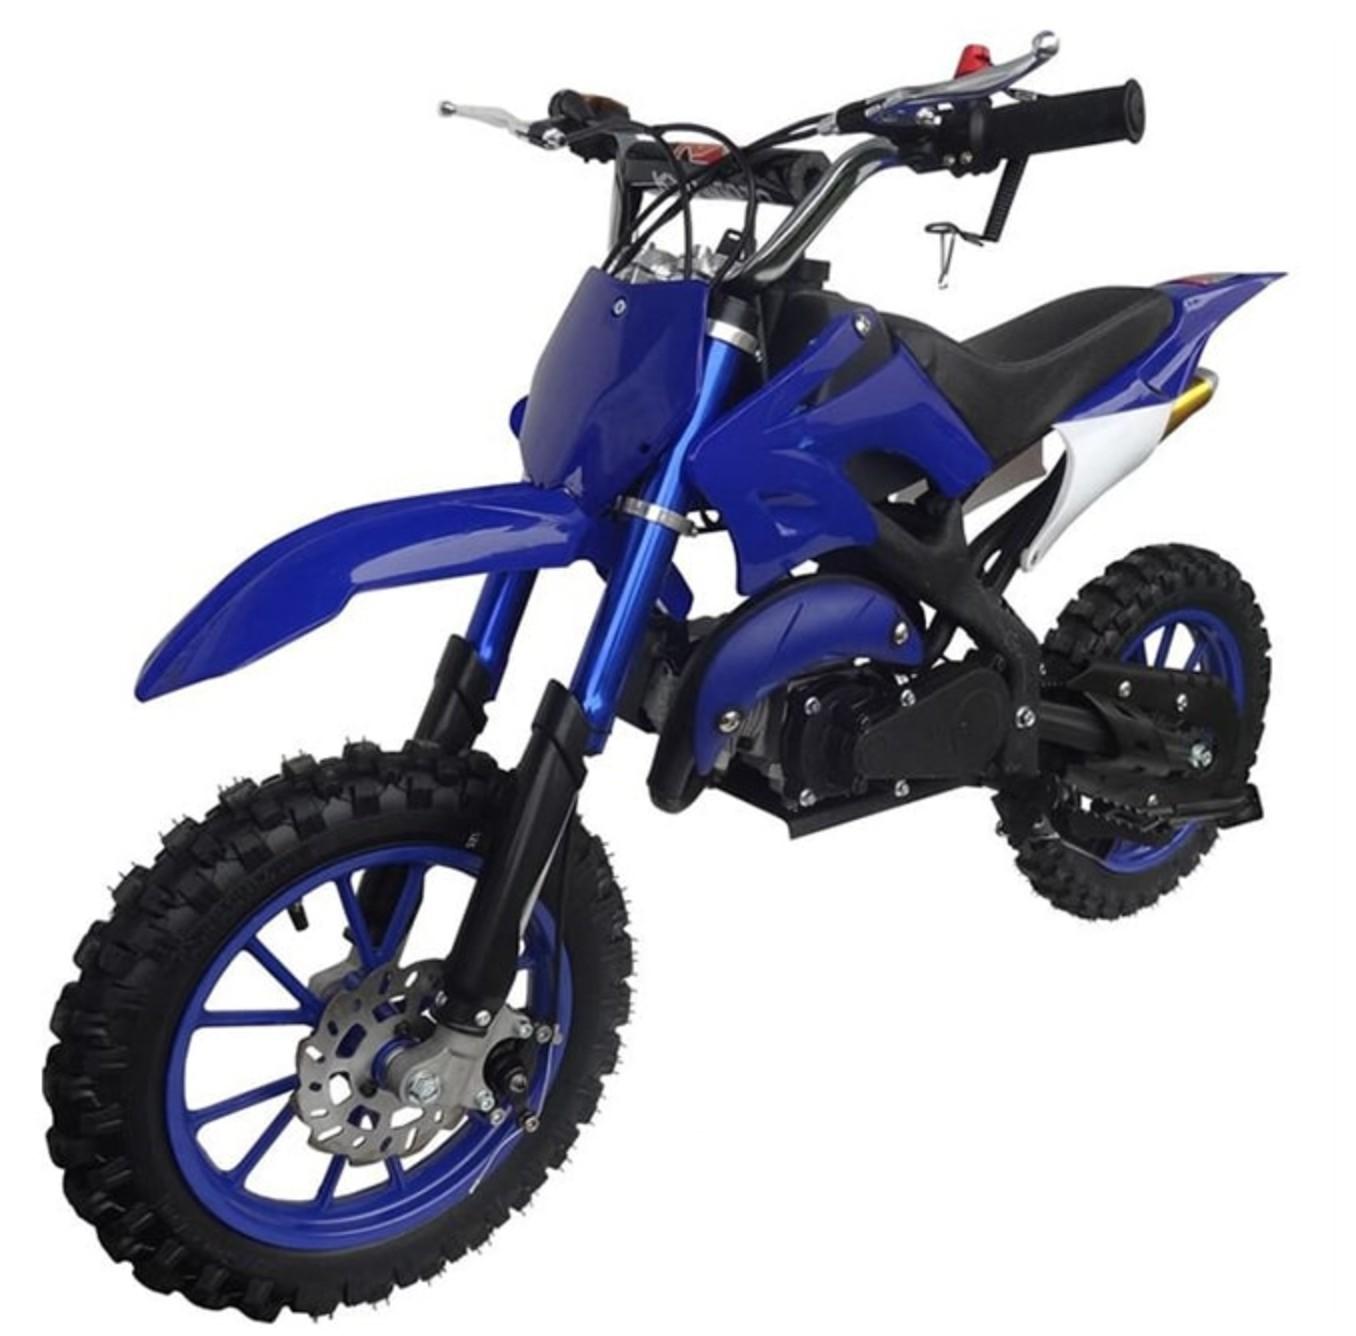 moto cross kxd 708 bleu. Black Bedroom Furniture Sets. Home Design Ideas